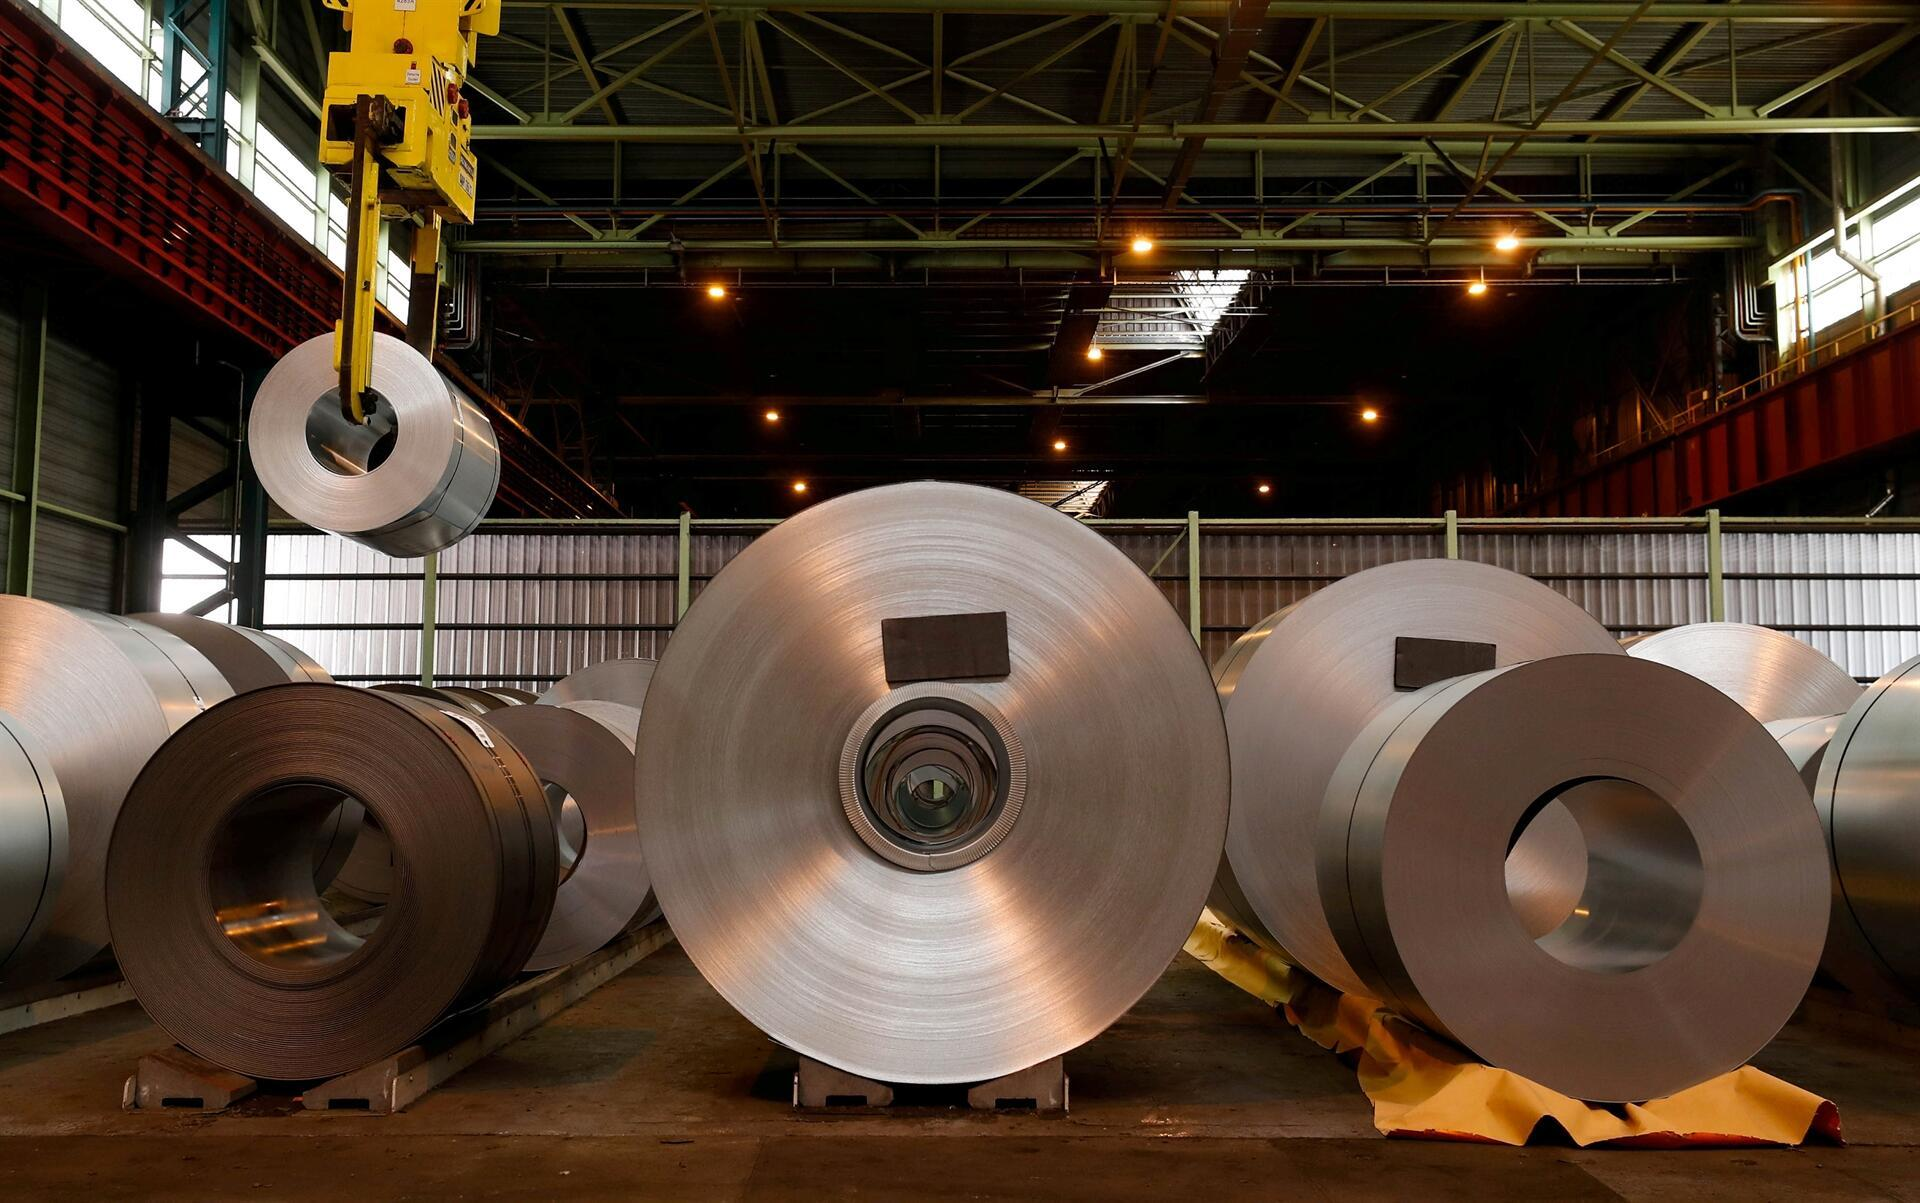 US-China trade dispute hitting German companies: Chambers